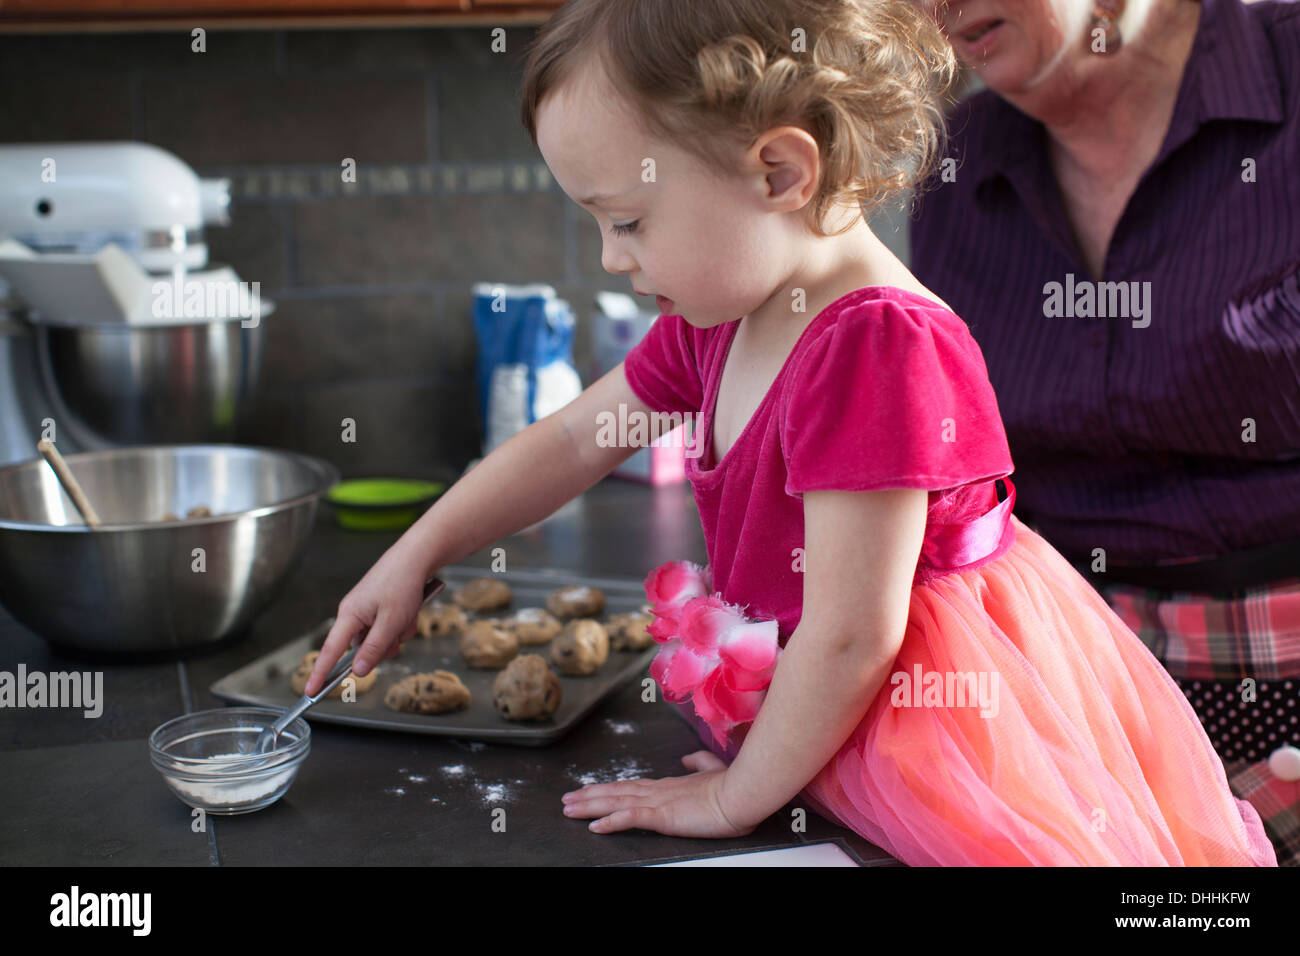 Grand-mère et petite-fille baking cookies Photo Stock